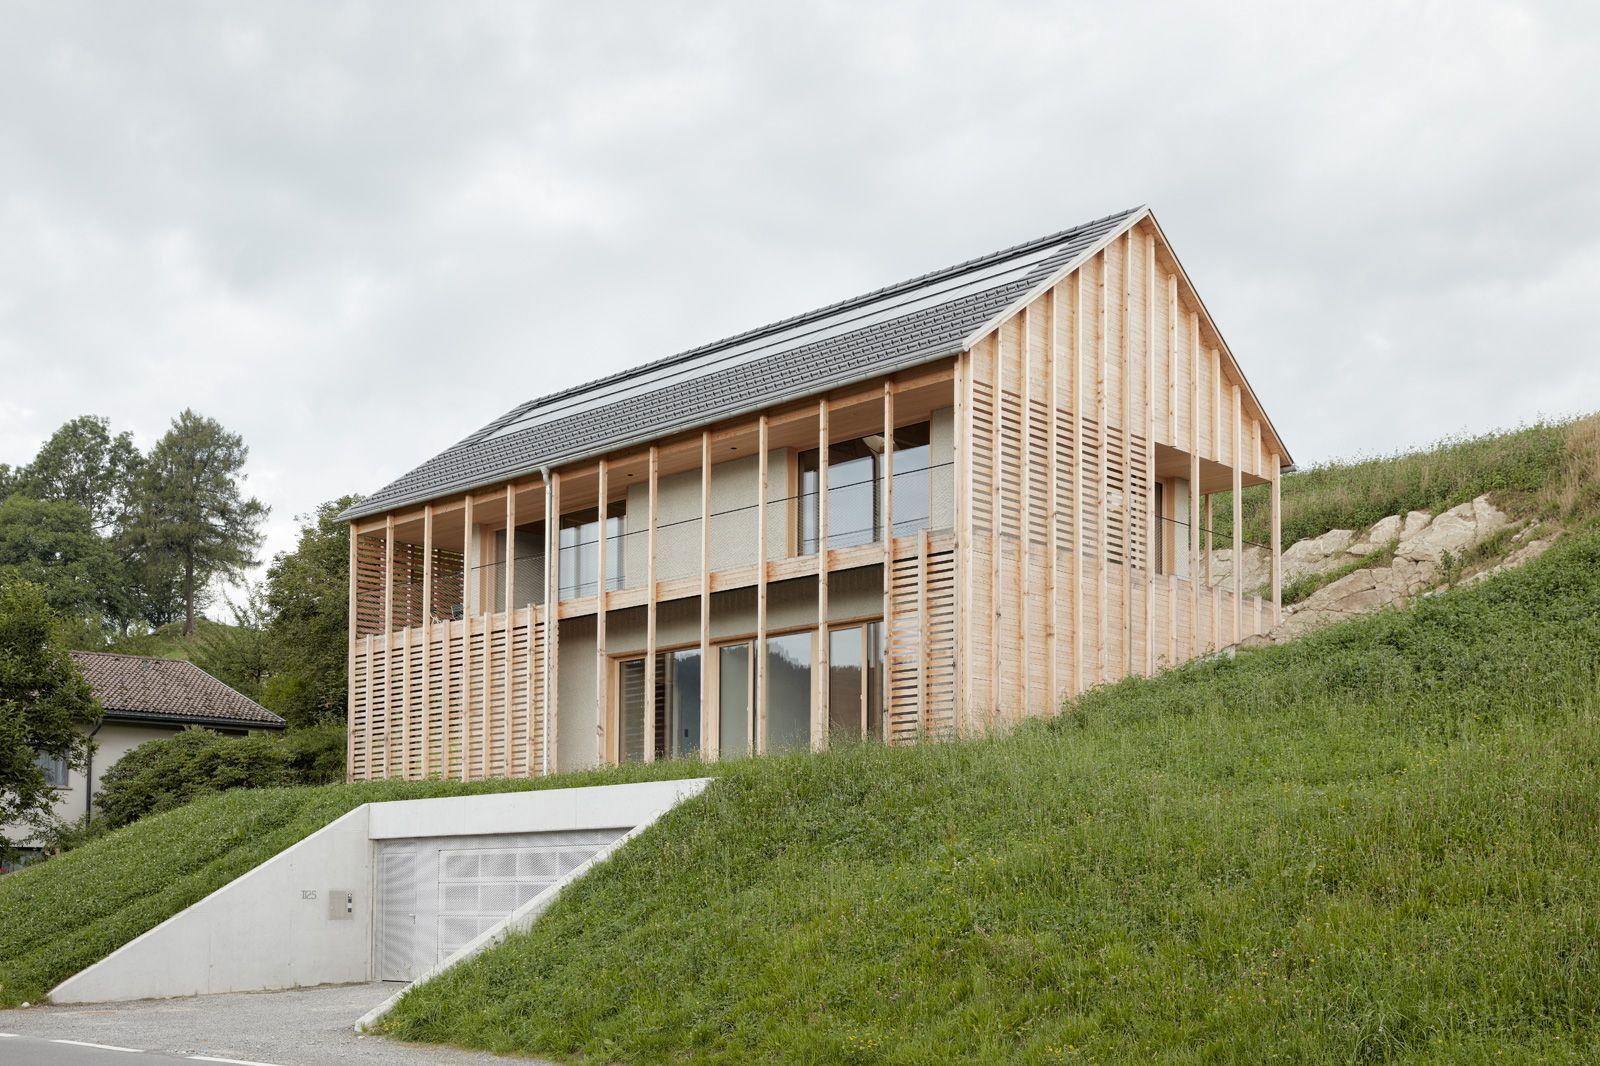 Architekten innauer matt holzbau pinterest for Moderne villen grundriss